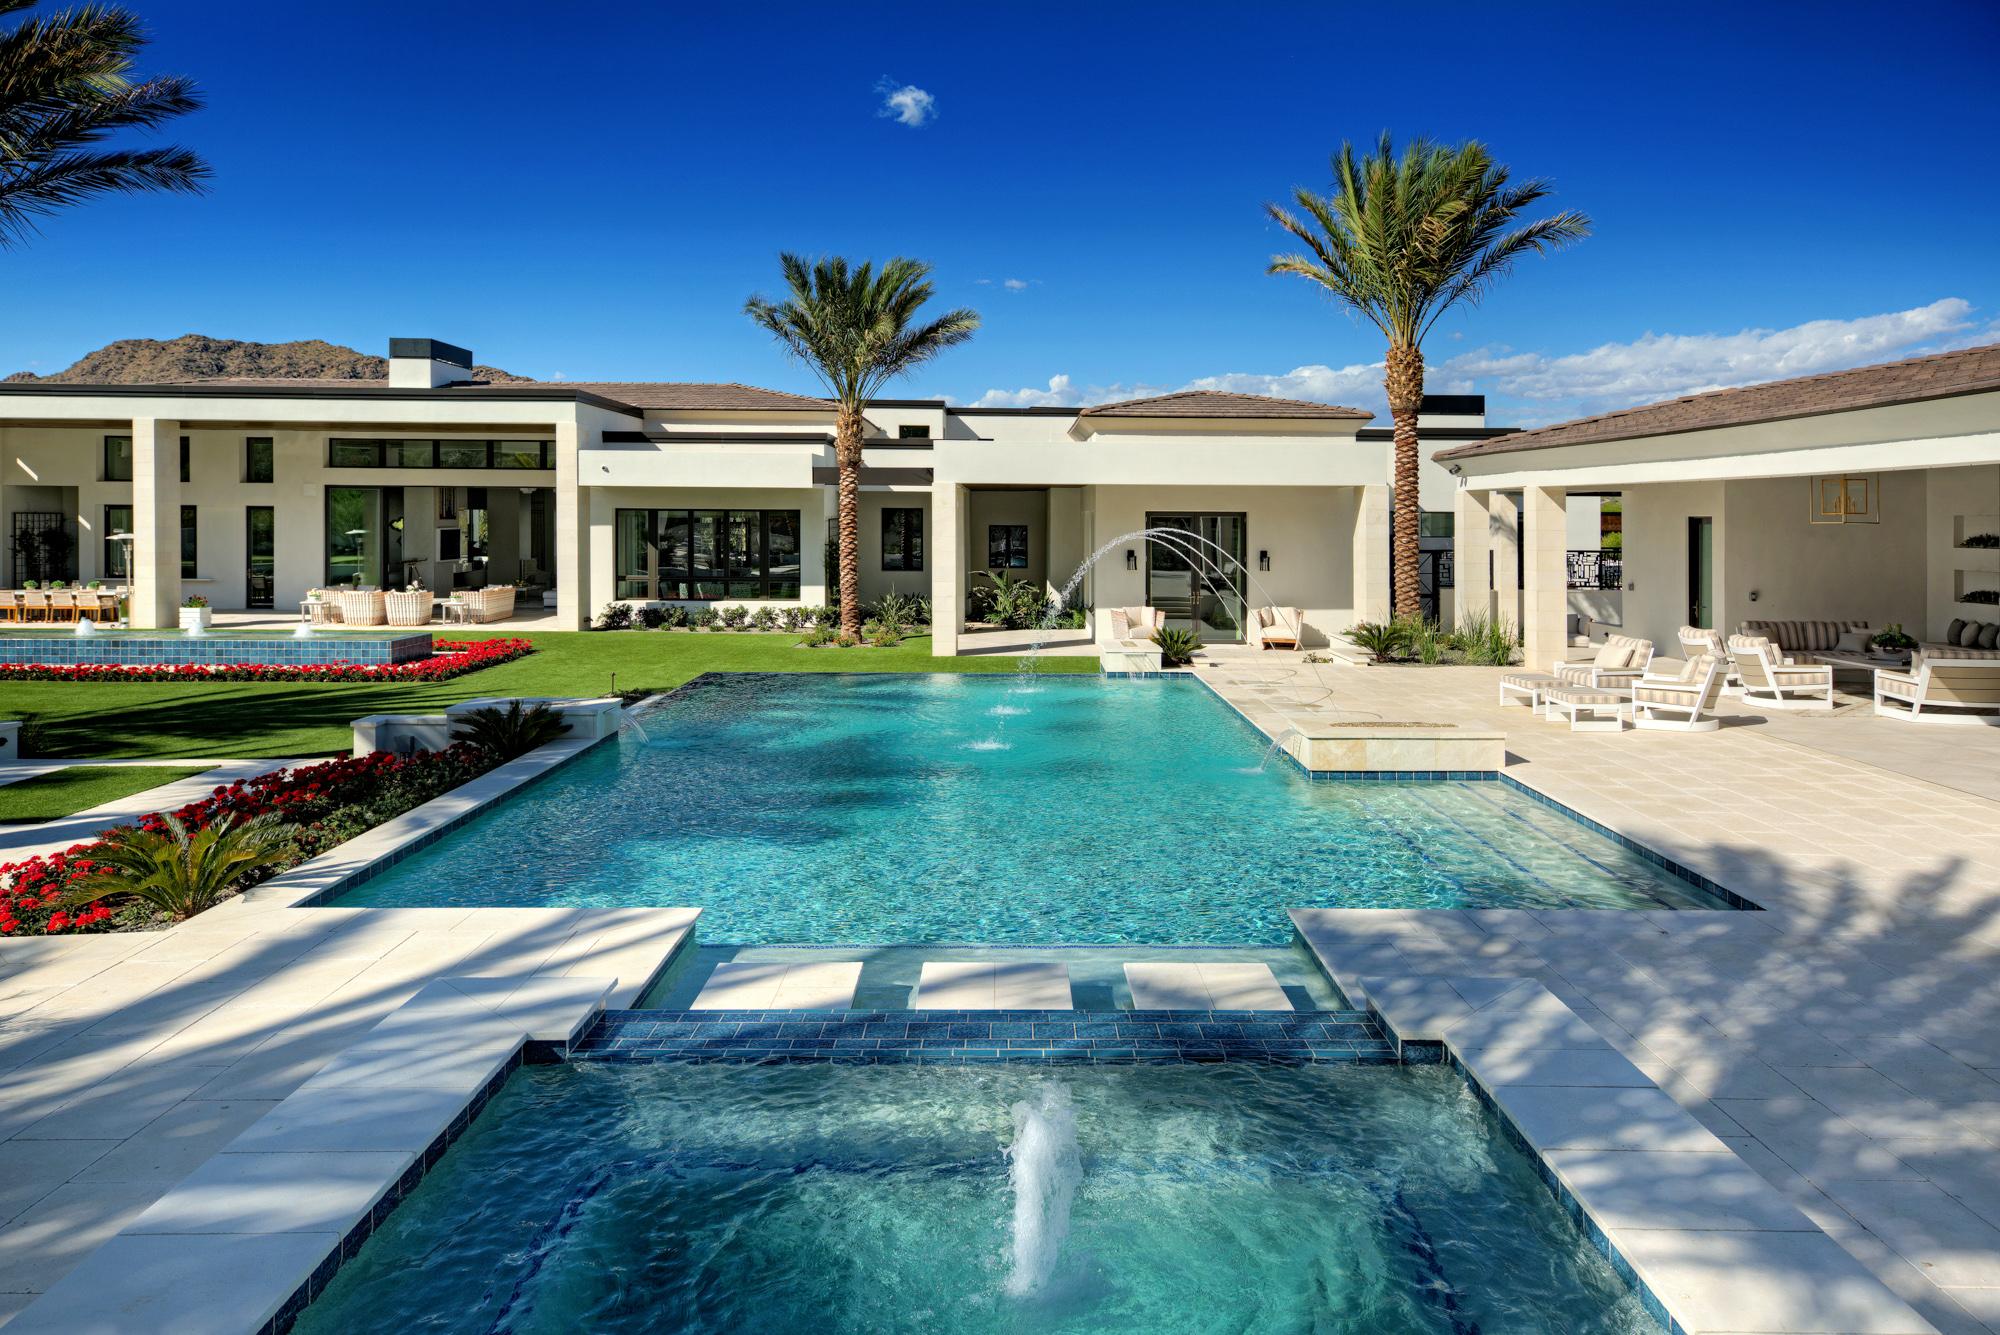 Luxury Swimming Pool Designs — Presidential Pools, Spas ... on Luxury Backyard Design  id=88451